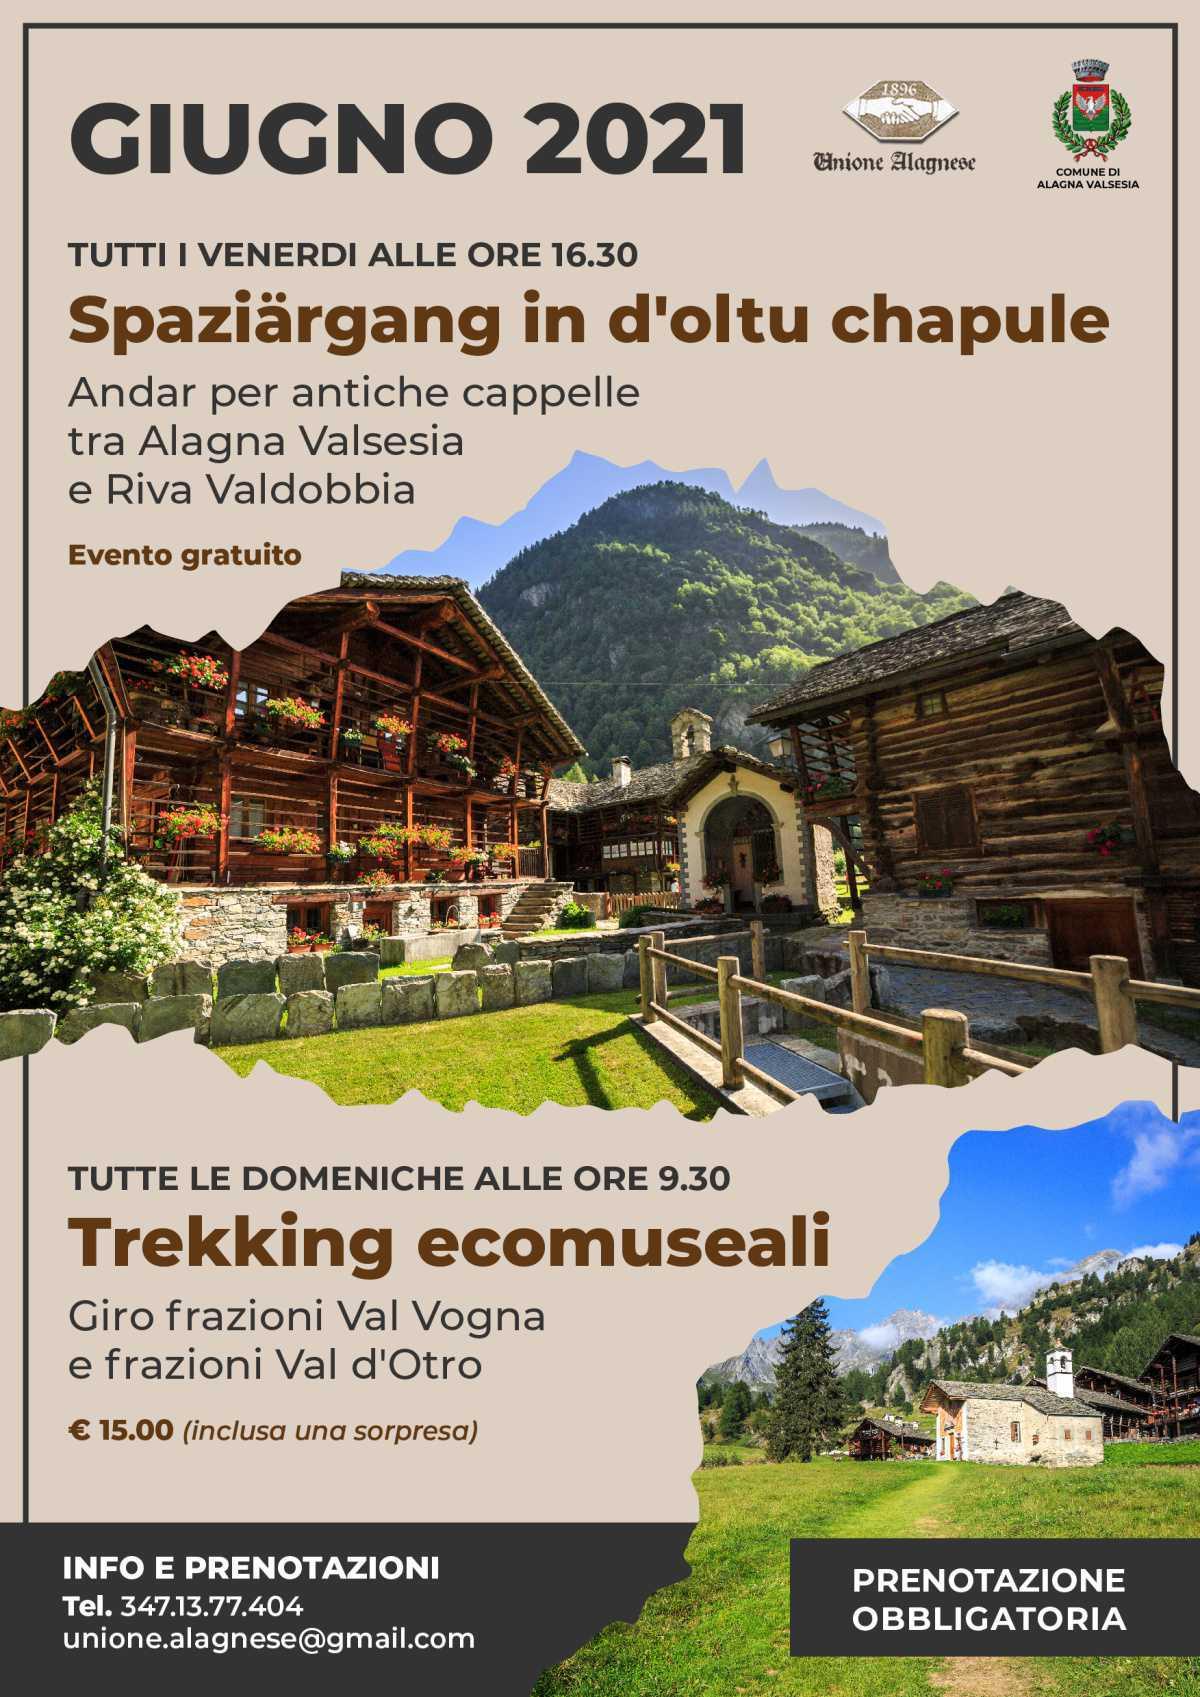 Trekking Ecomuseali - Alagna Valsesia